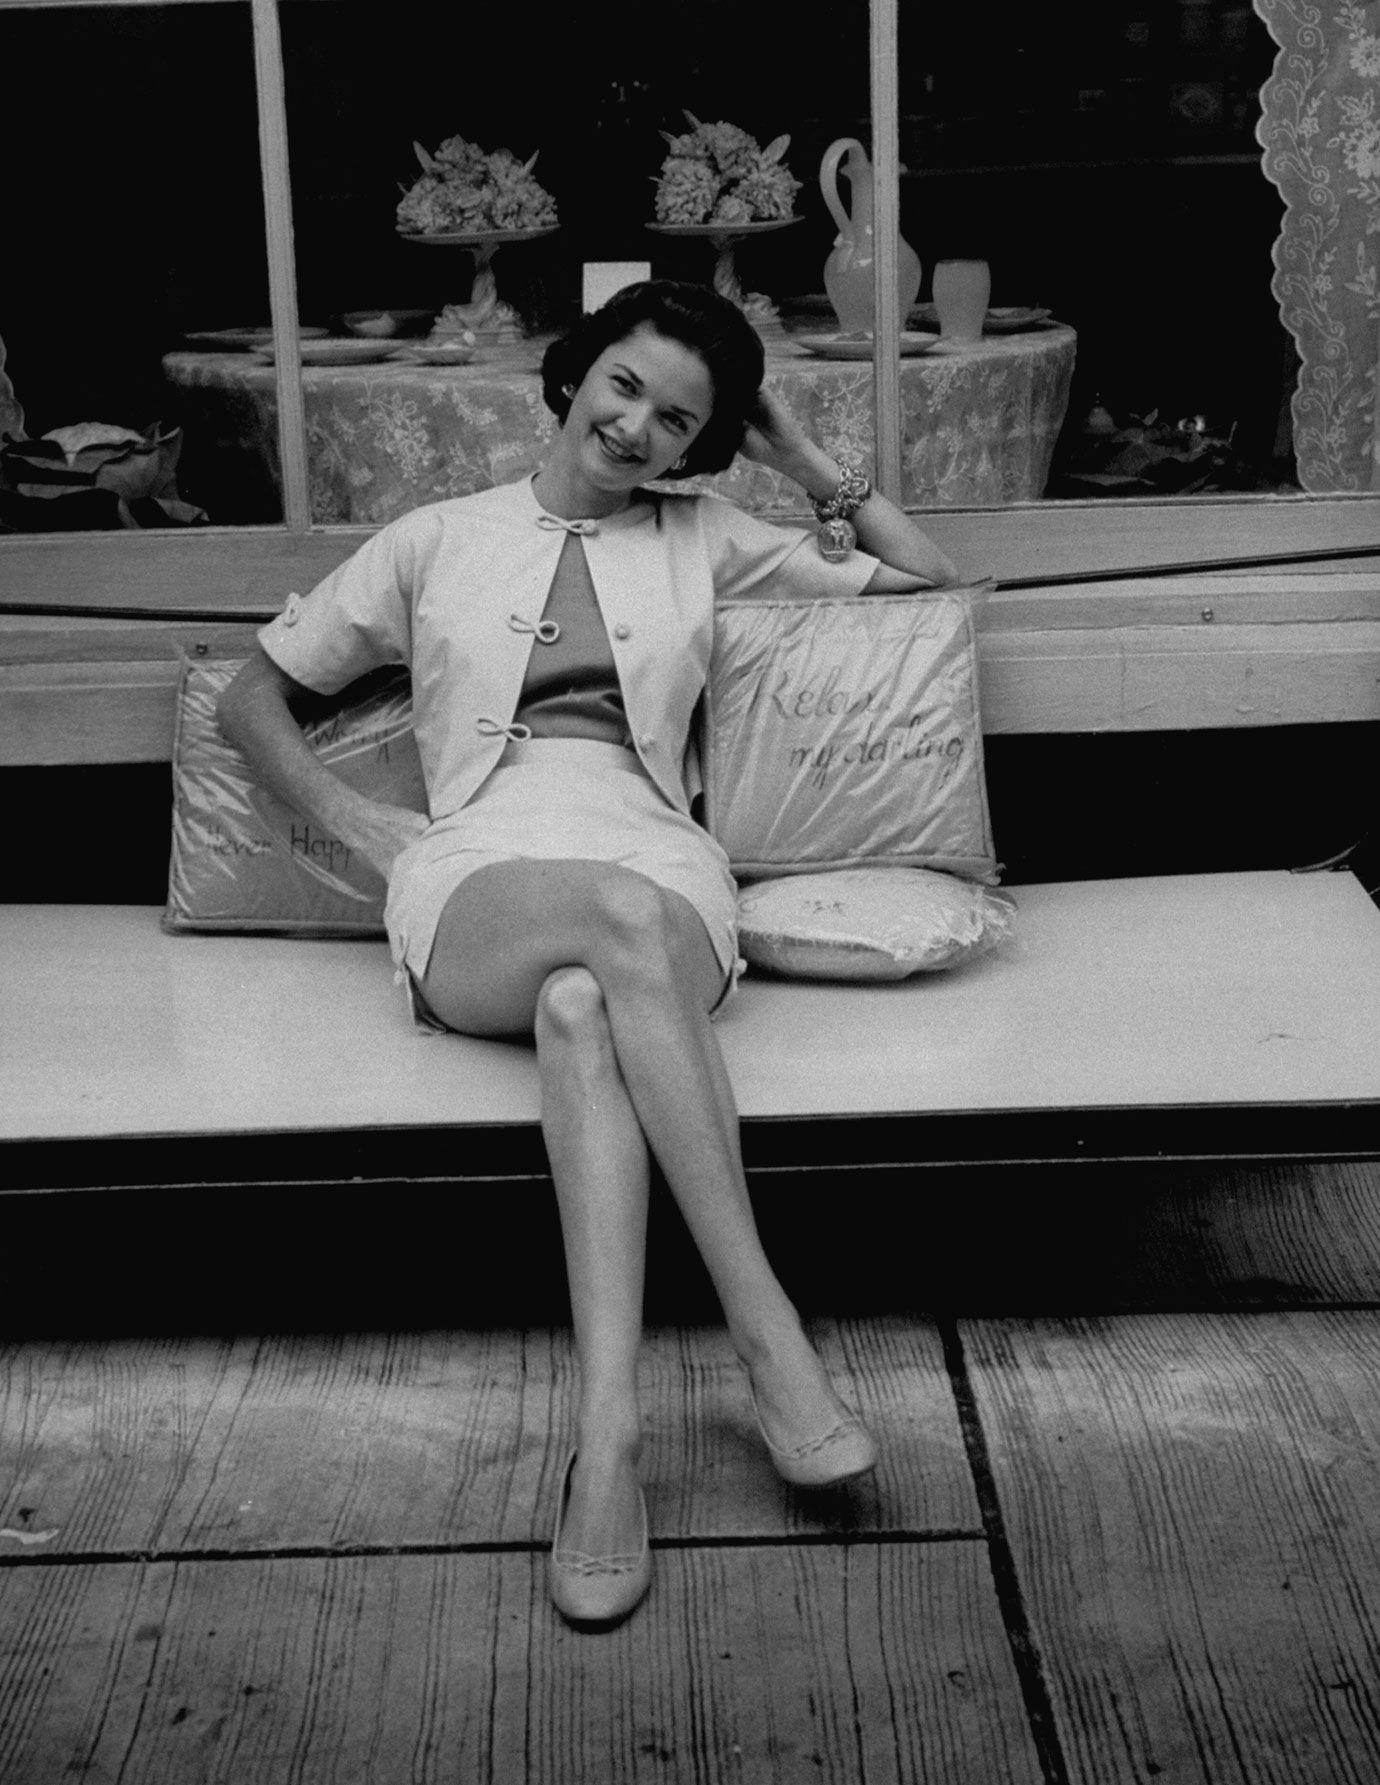 Charlene Wrightsman Second Wife Of Gossip Columnist Igor Cassini Palm Beach Florida 1956